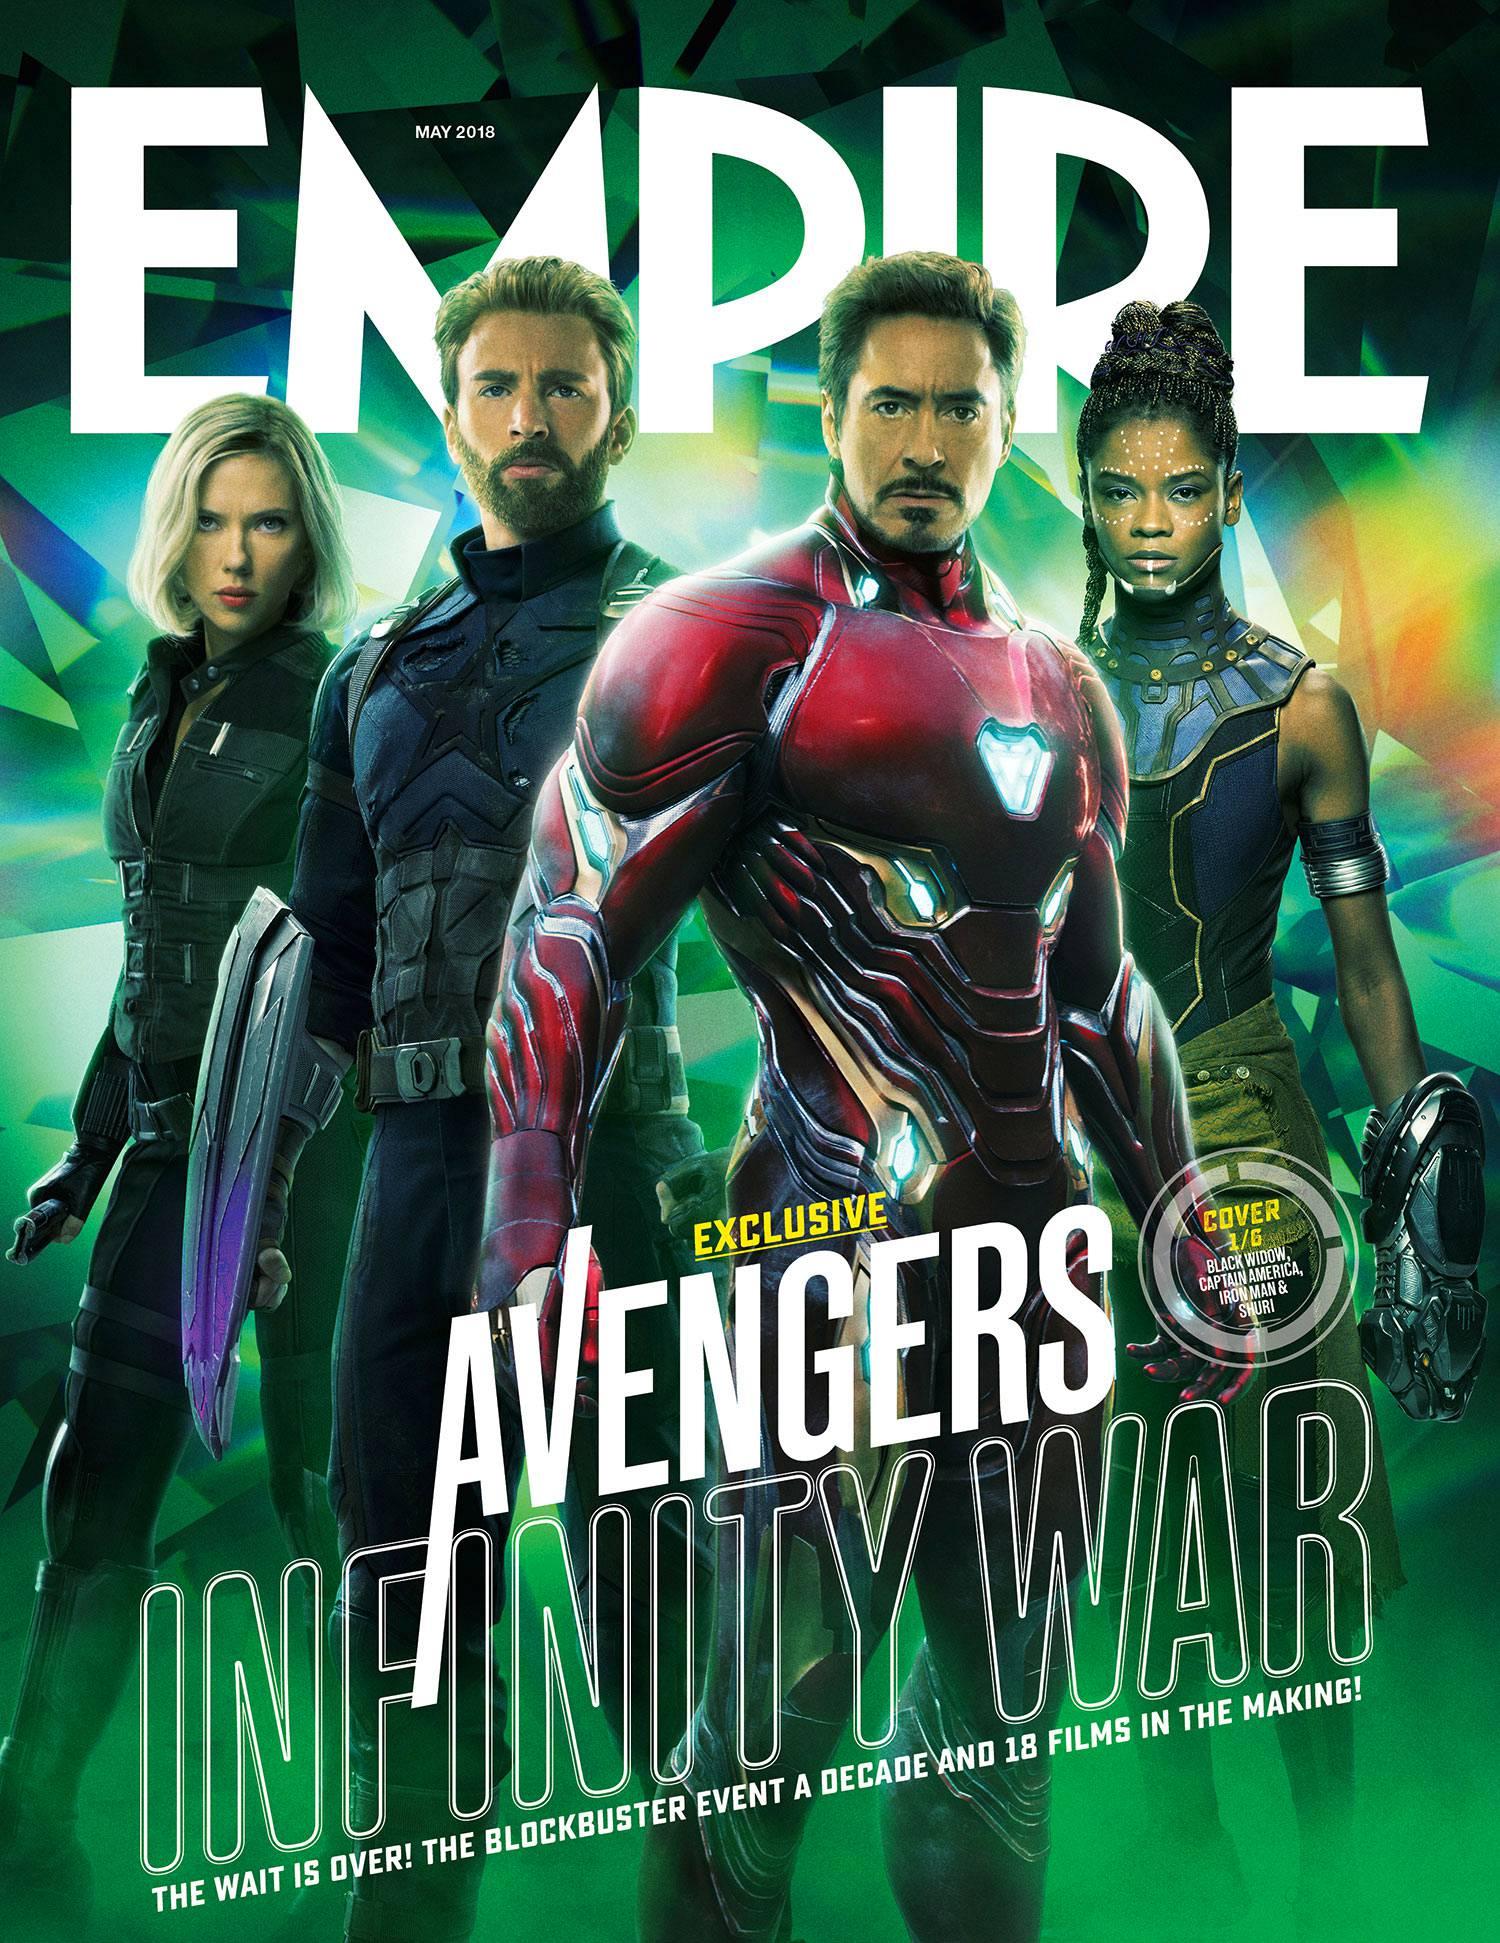 Empire Magazine Avengers: Infinity War